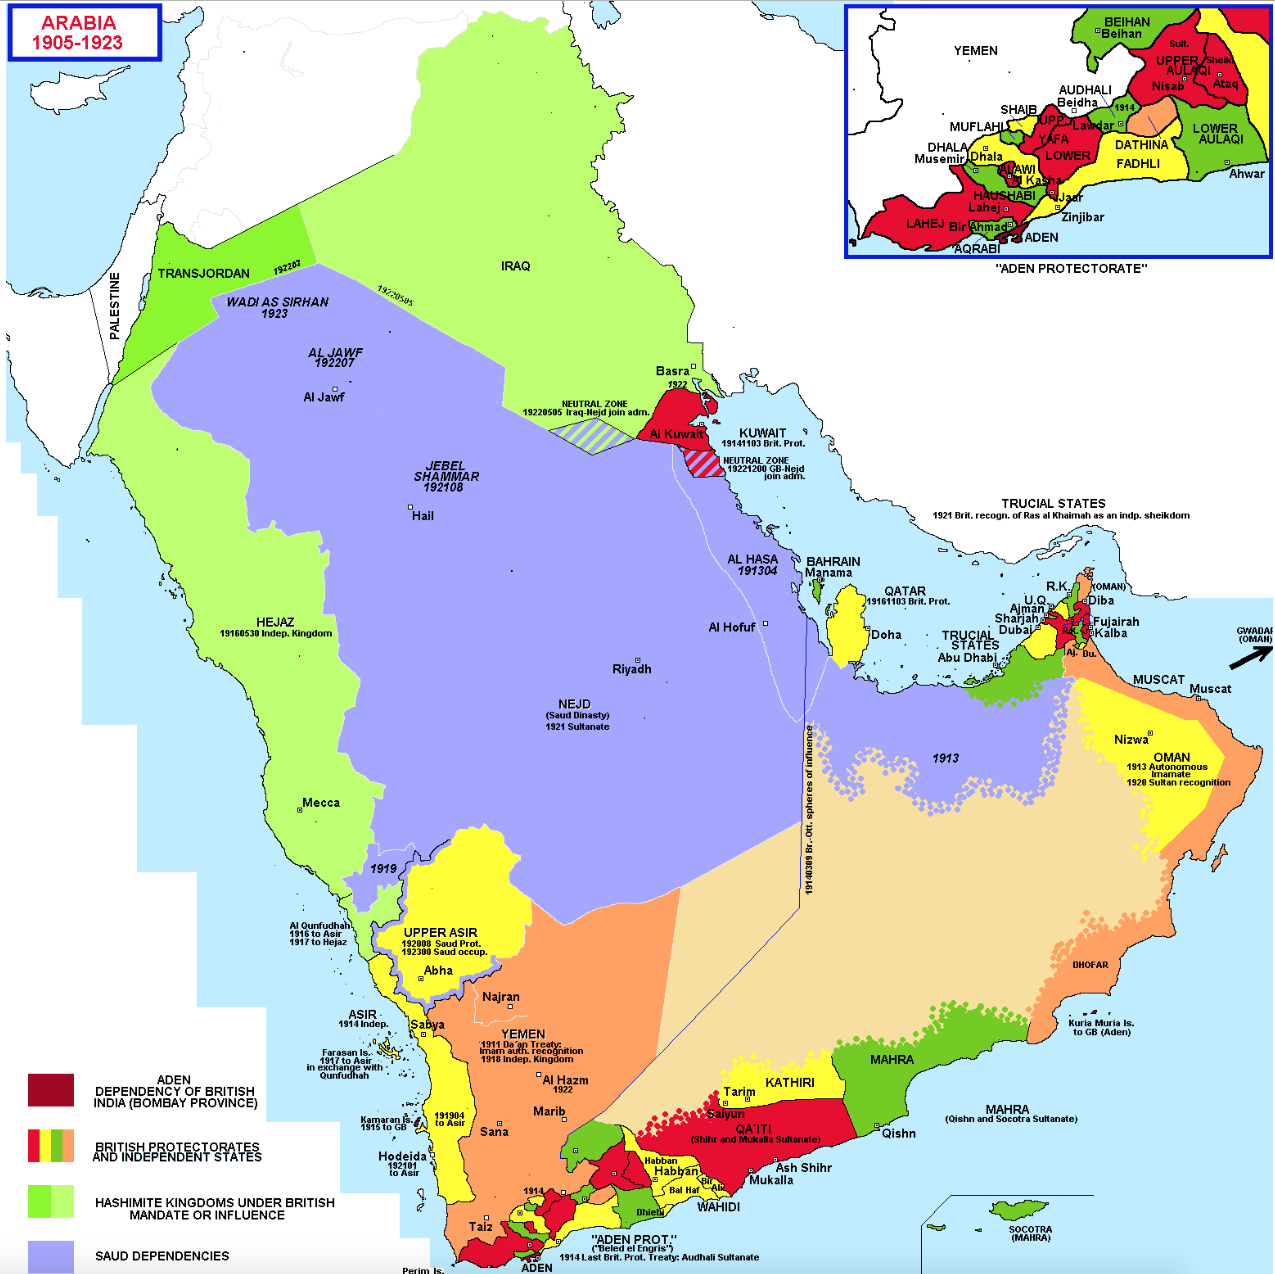 F2 What Saudi Arabia and its neighbors looked like 100 years ago